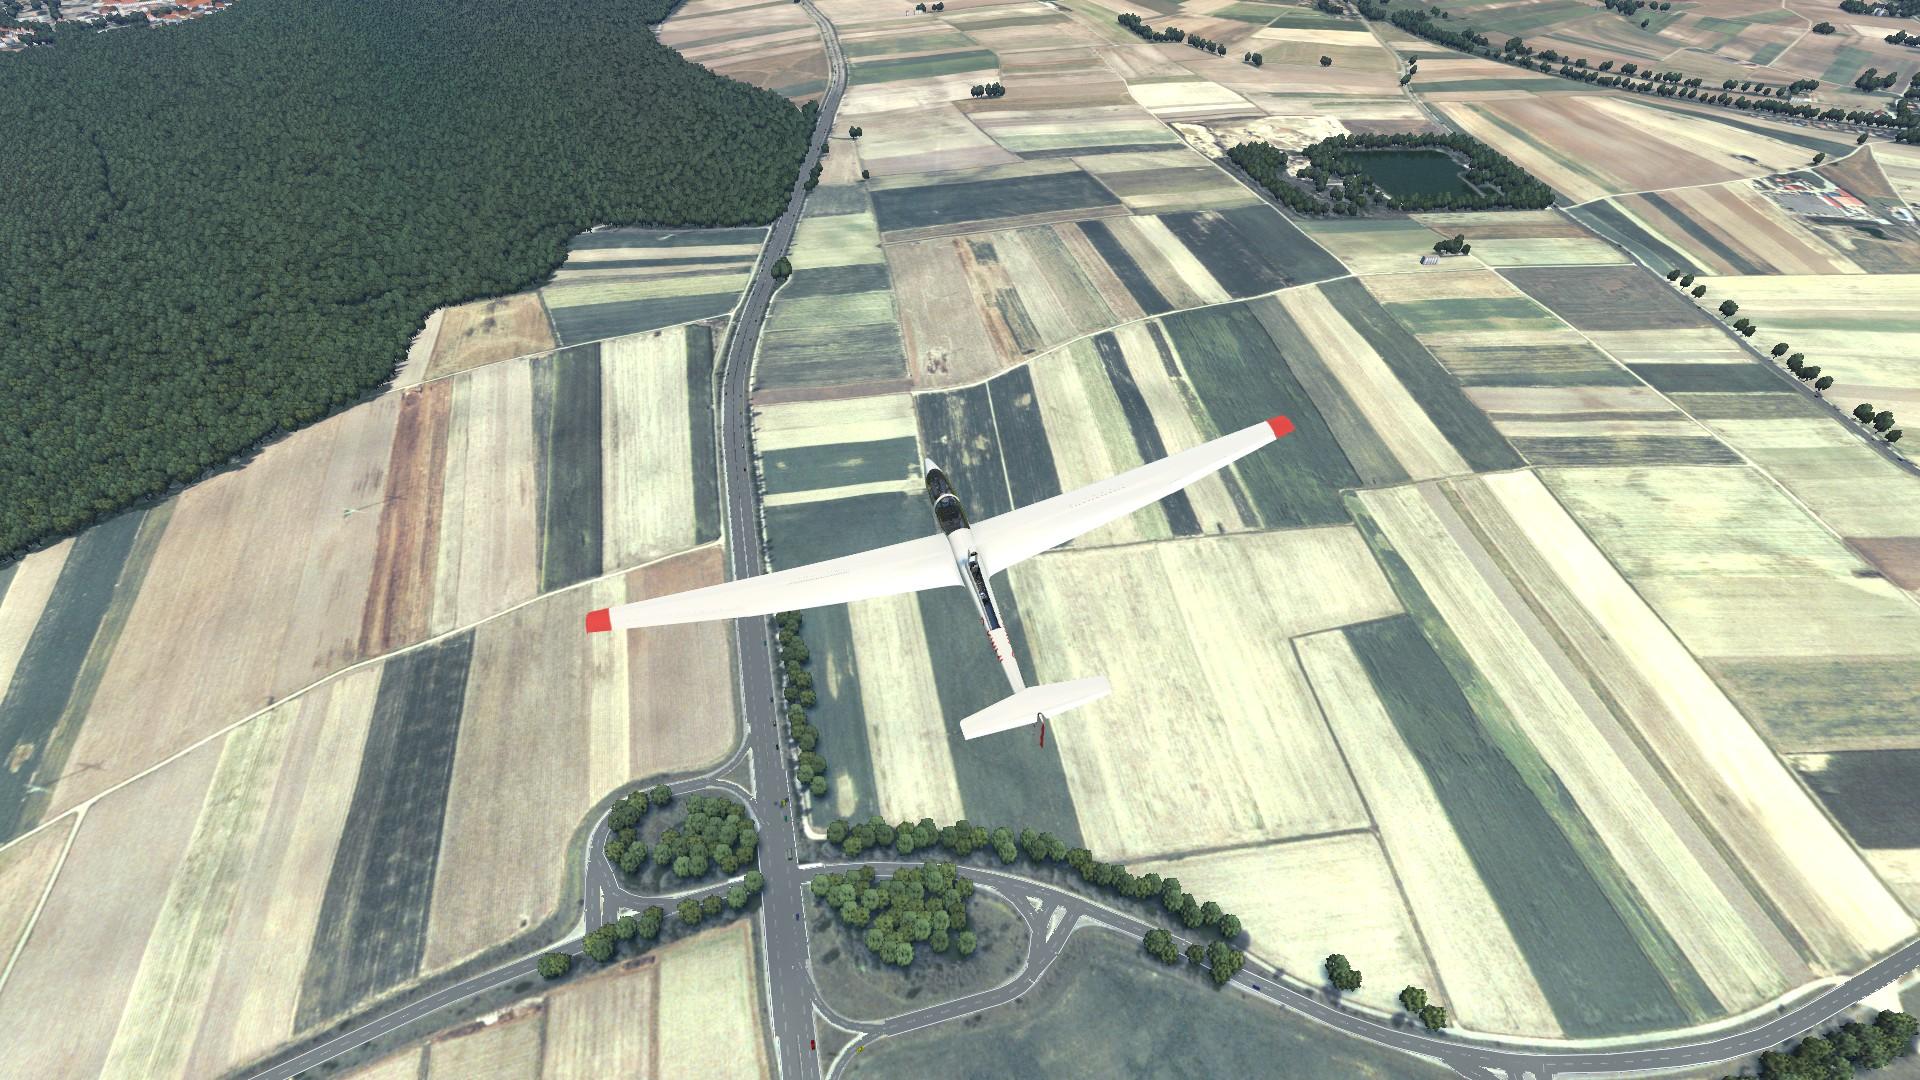 plane flying video games Farmland aerosoft gameplay